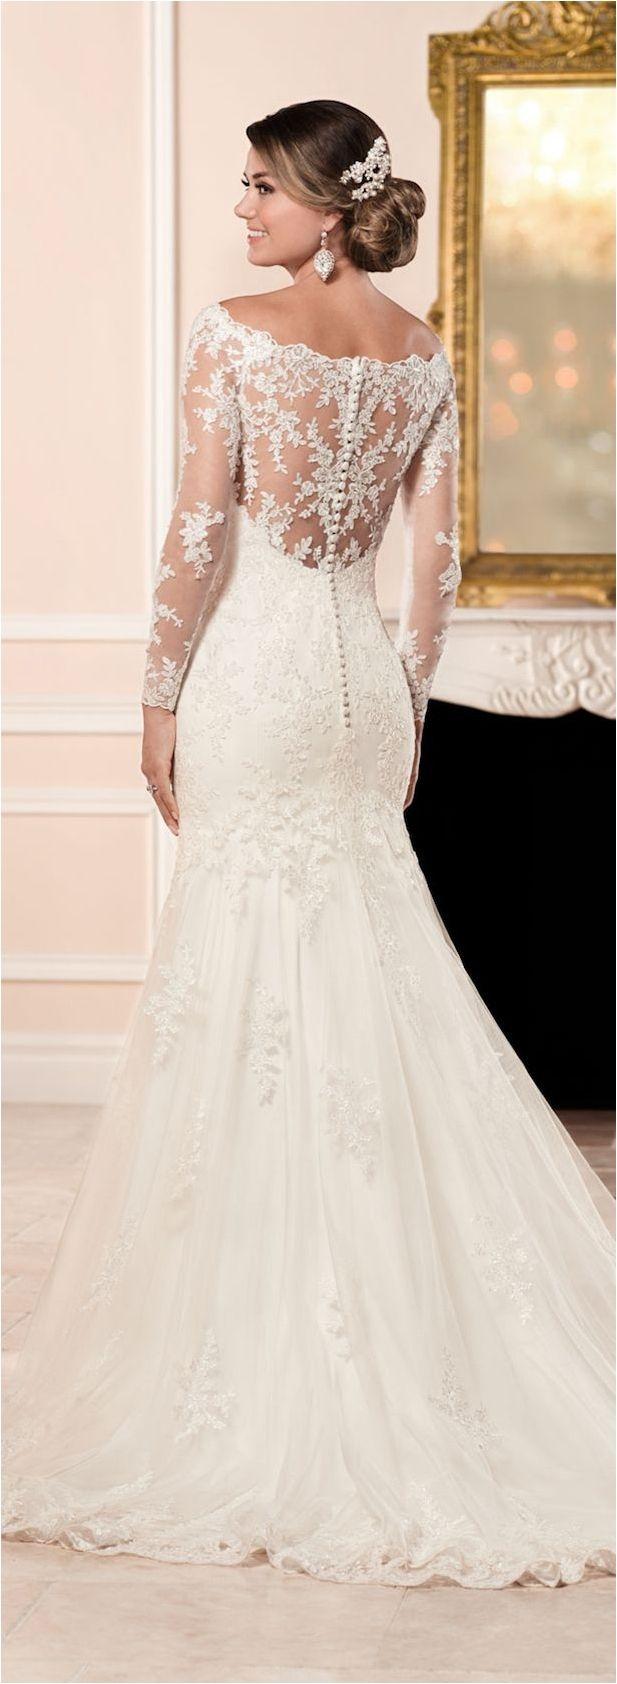 Casual wedding dresses for fuller figures   best Wedding dresses the elegant ucbody flattering